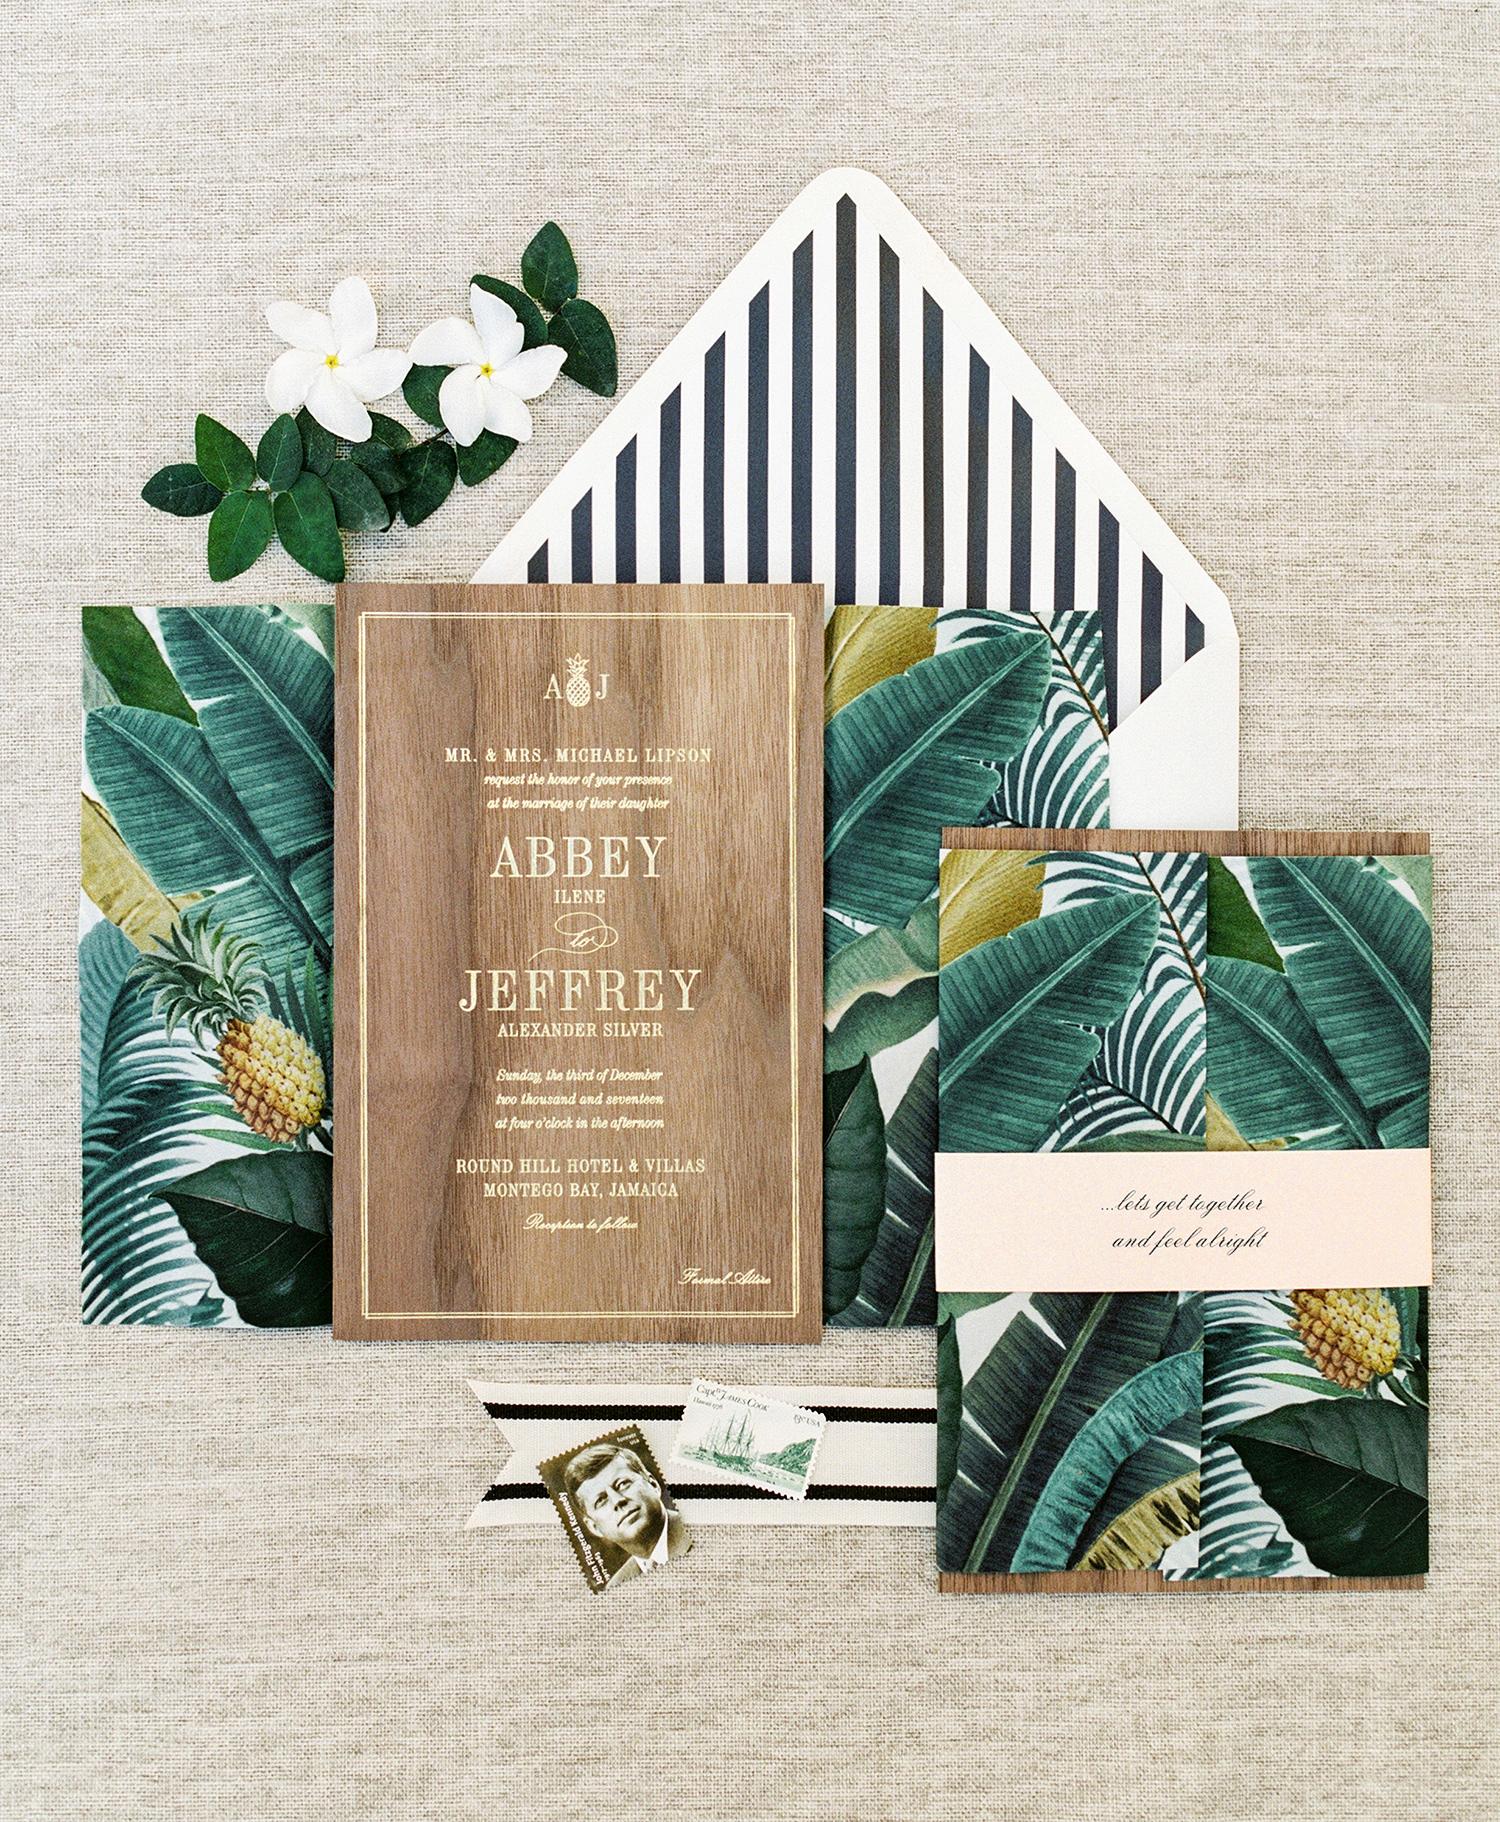 Palm Prints And Stripes Set The Tone